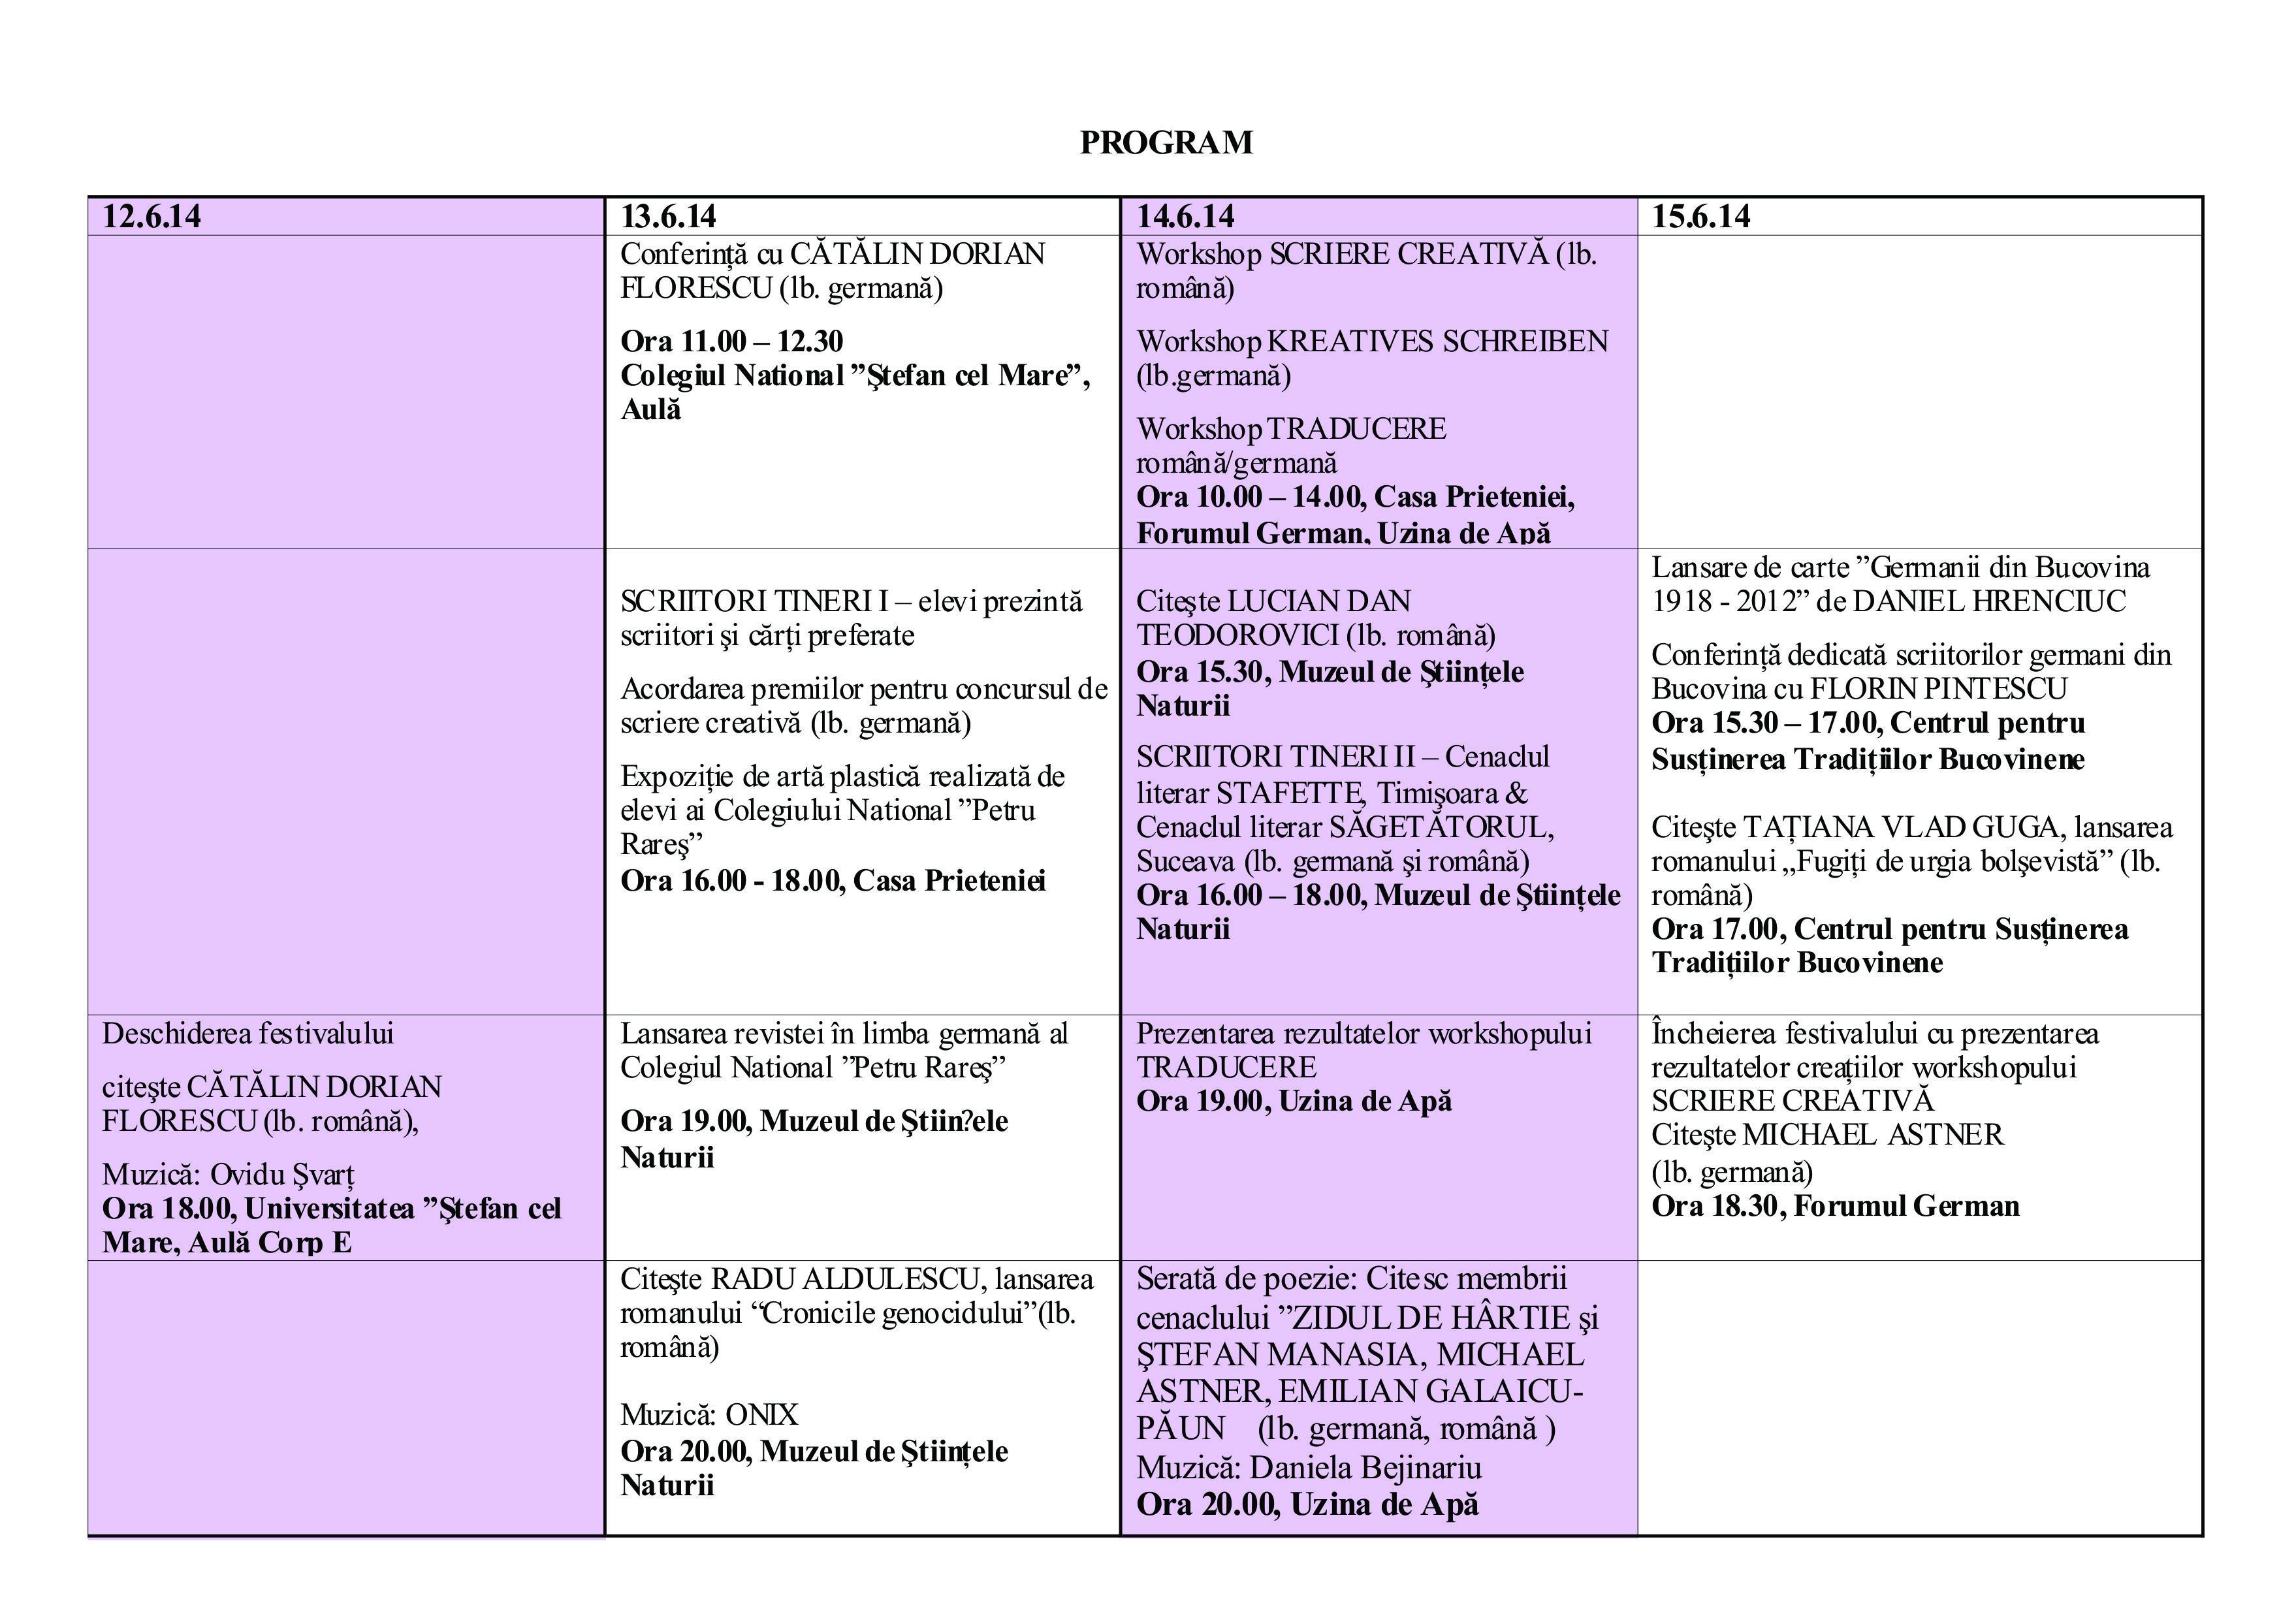 program lectora 2014 interior